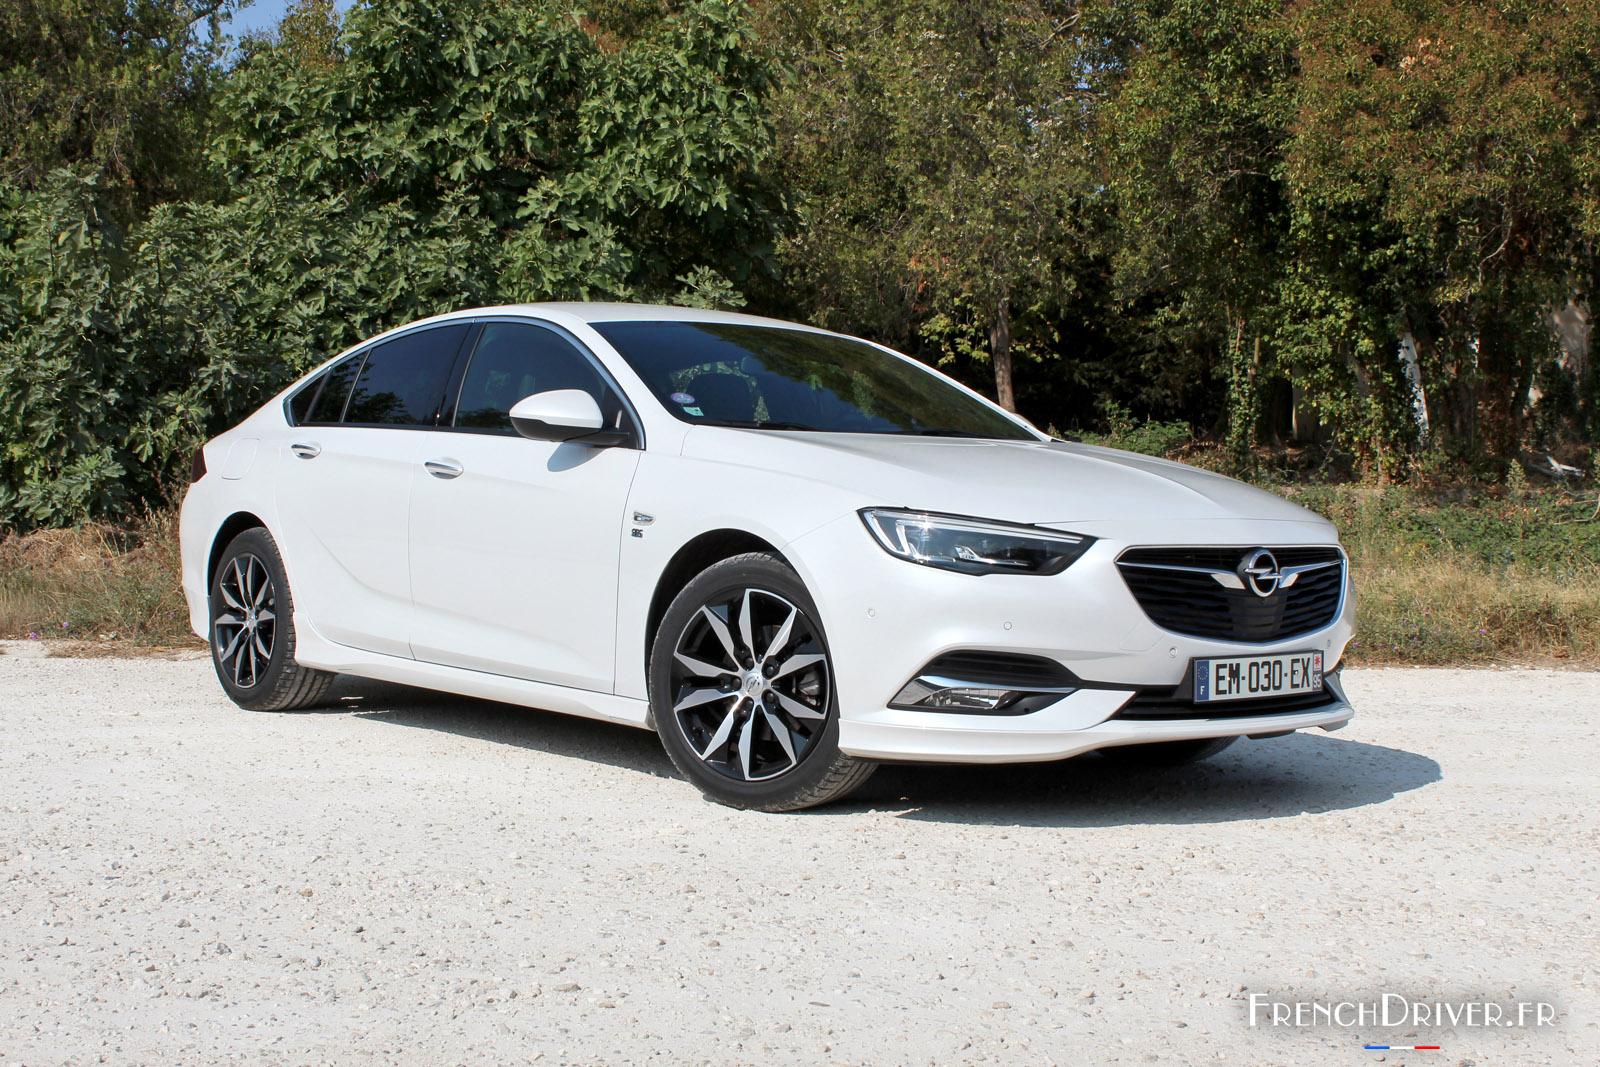 Essai Volvo Xc60 >> Essai Opel Insignia Grand Sport : nouvelle donne - French ...